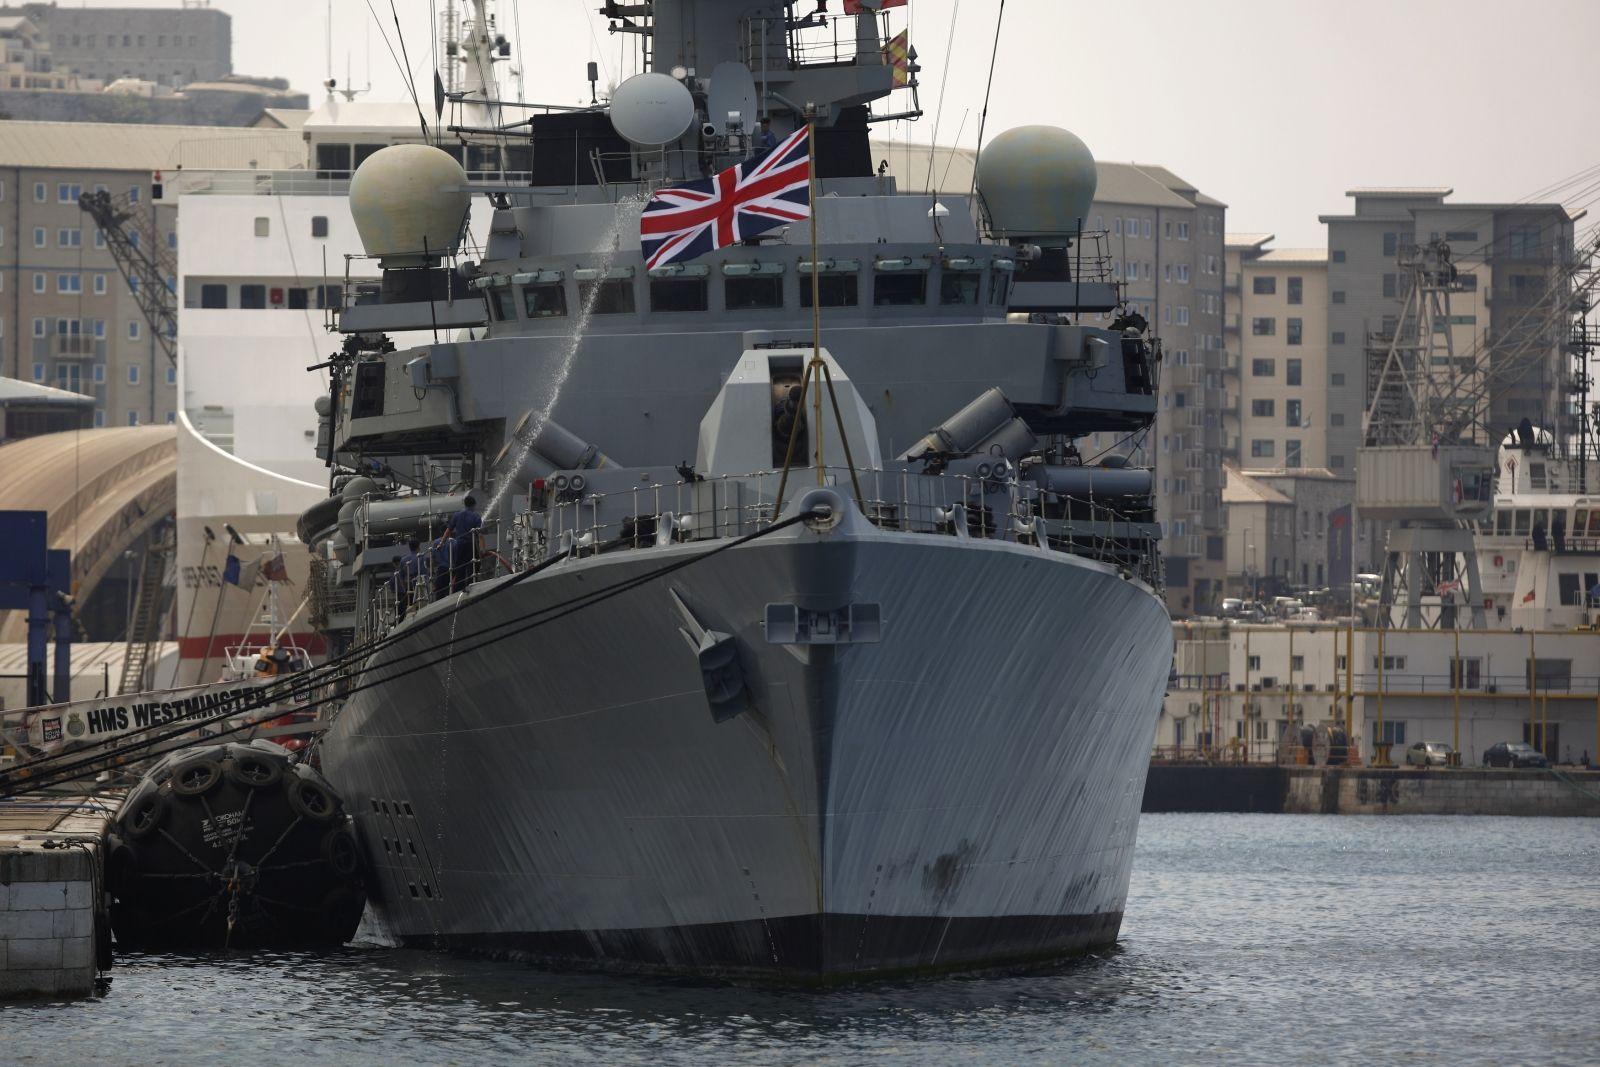 HMS Westminster Royal Navy